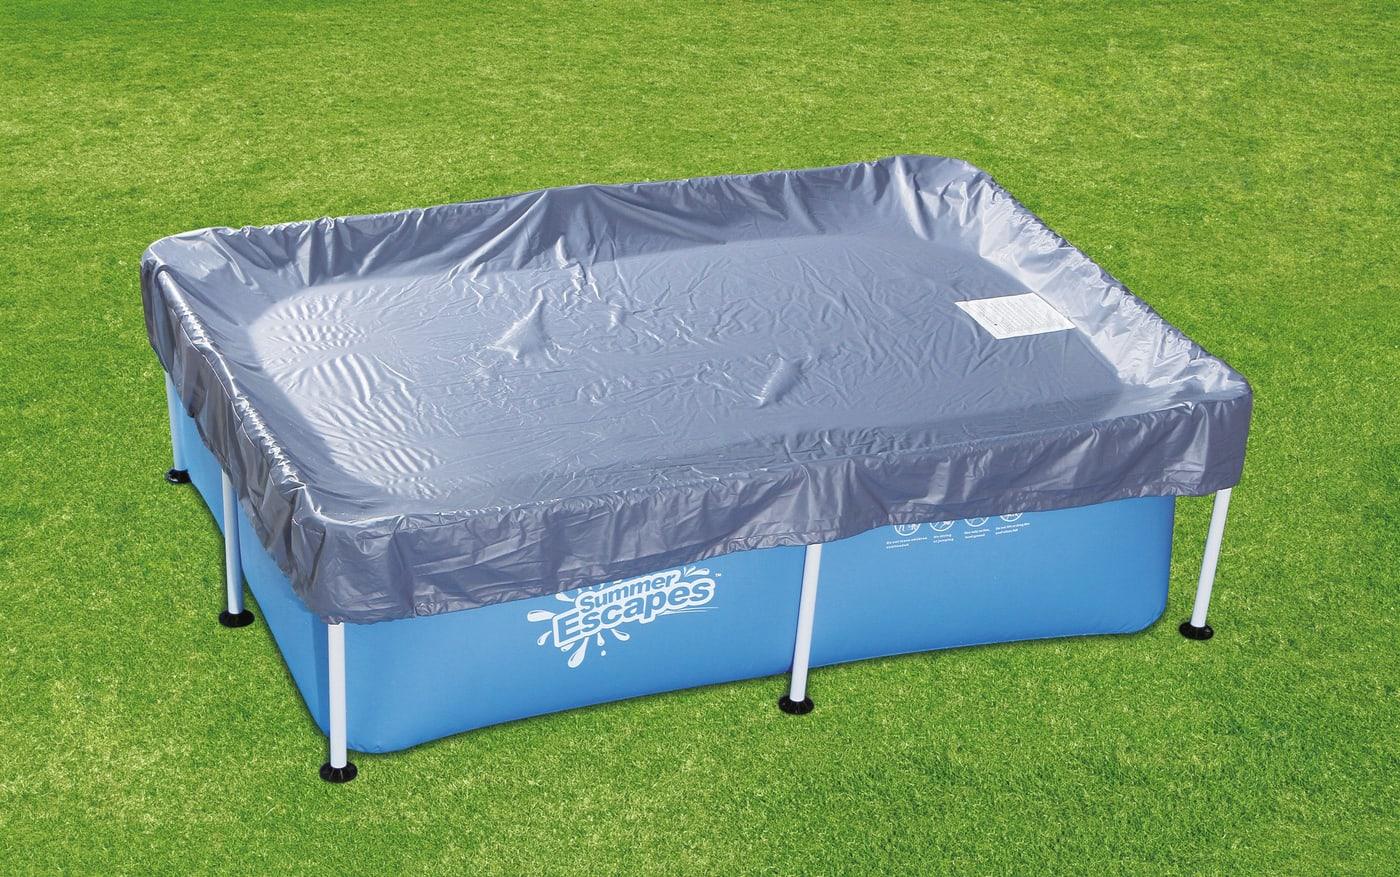 b che pour piscine tubulaire rectangulaire migros. Black Bedroom Furniture Sets. Home Design Ideas